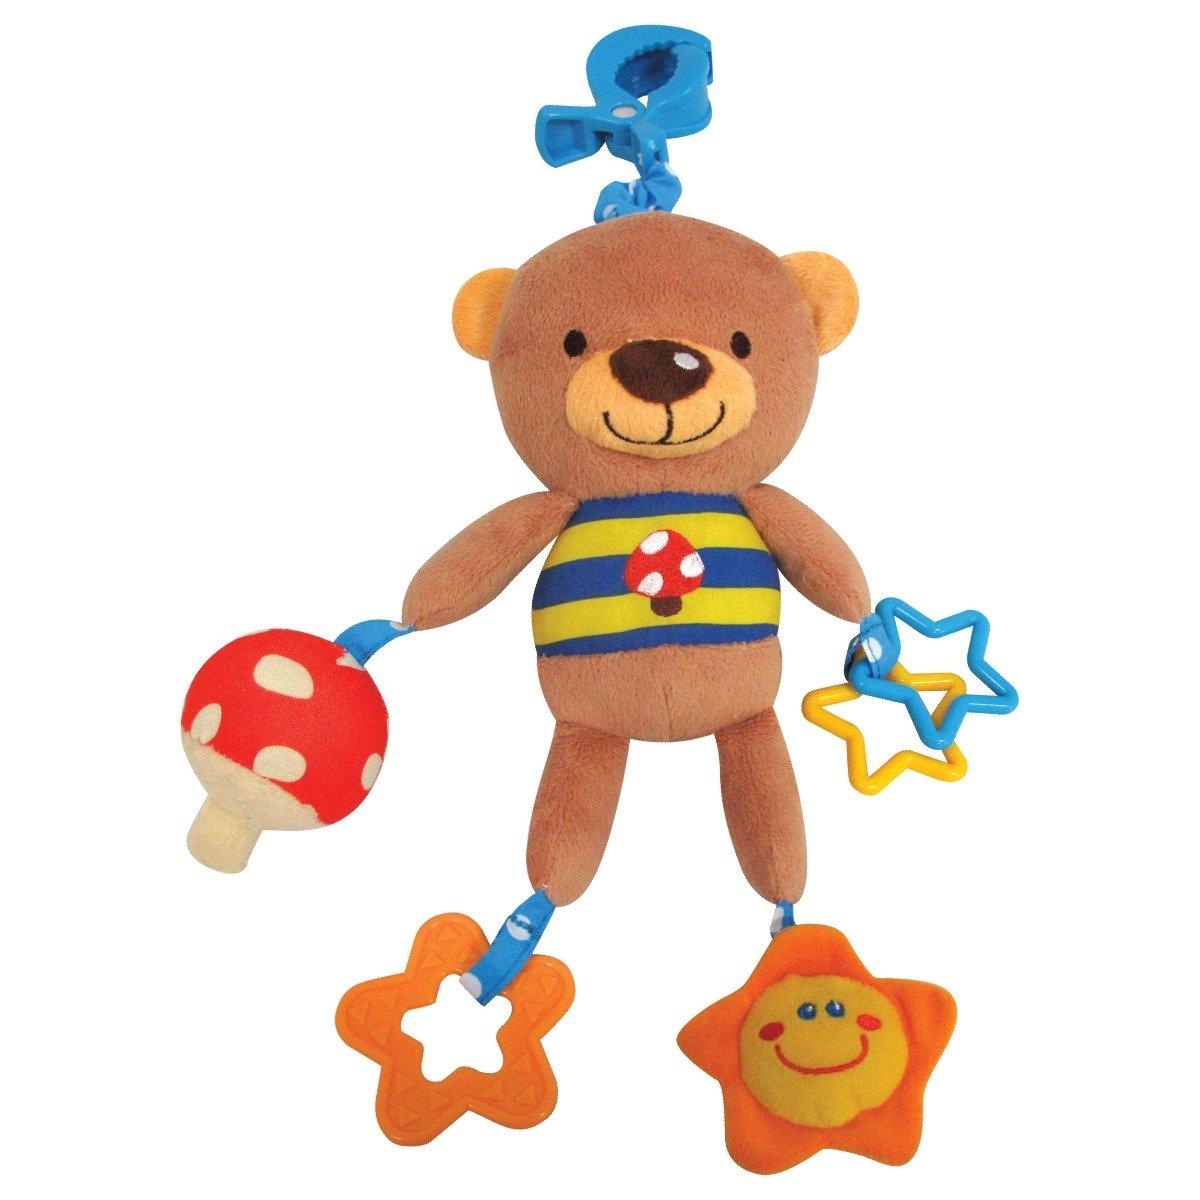 jucarie pentru carucior cu accesorii ursulet cu stelute